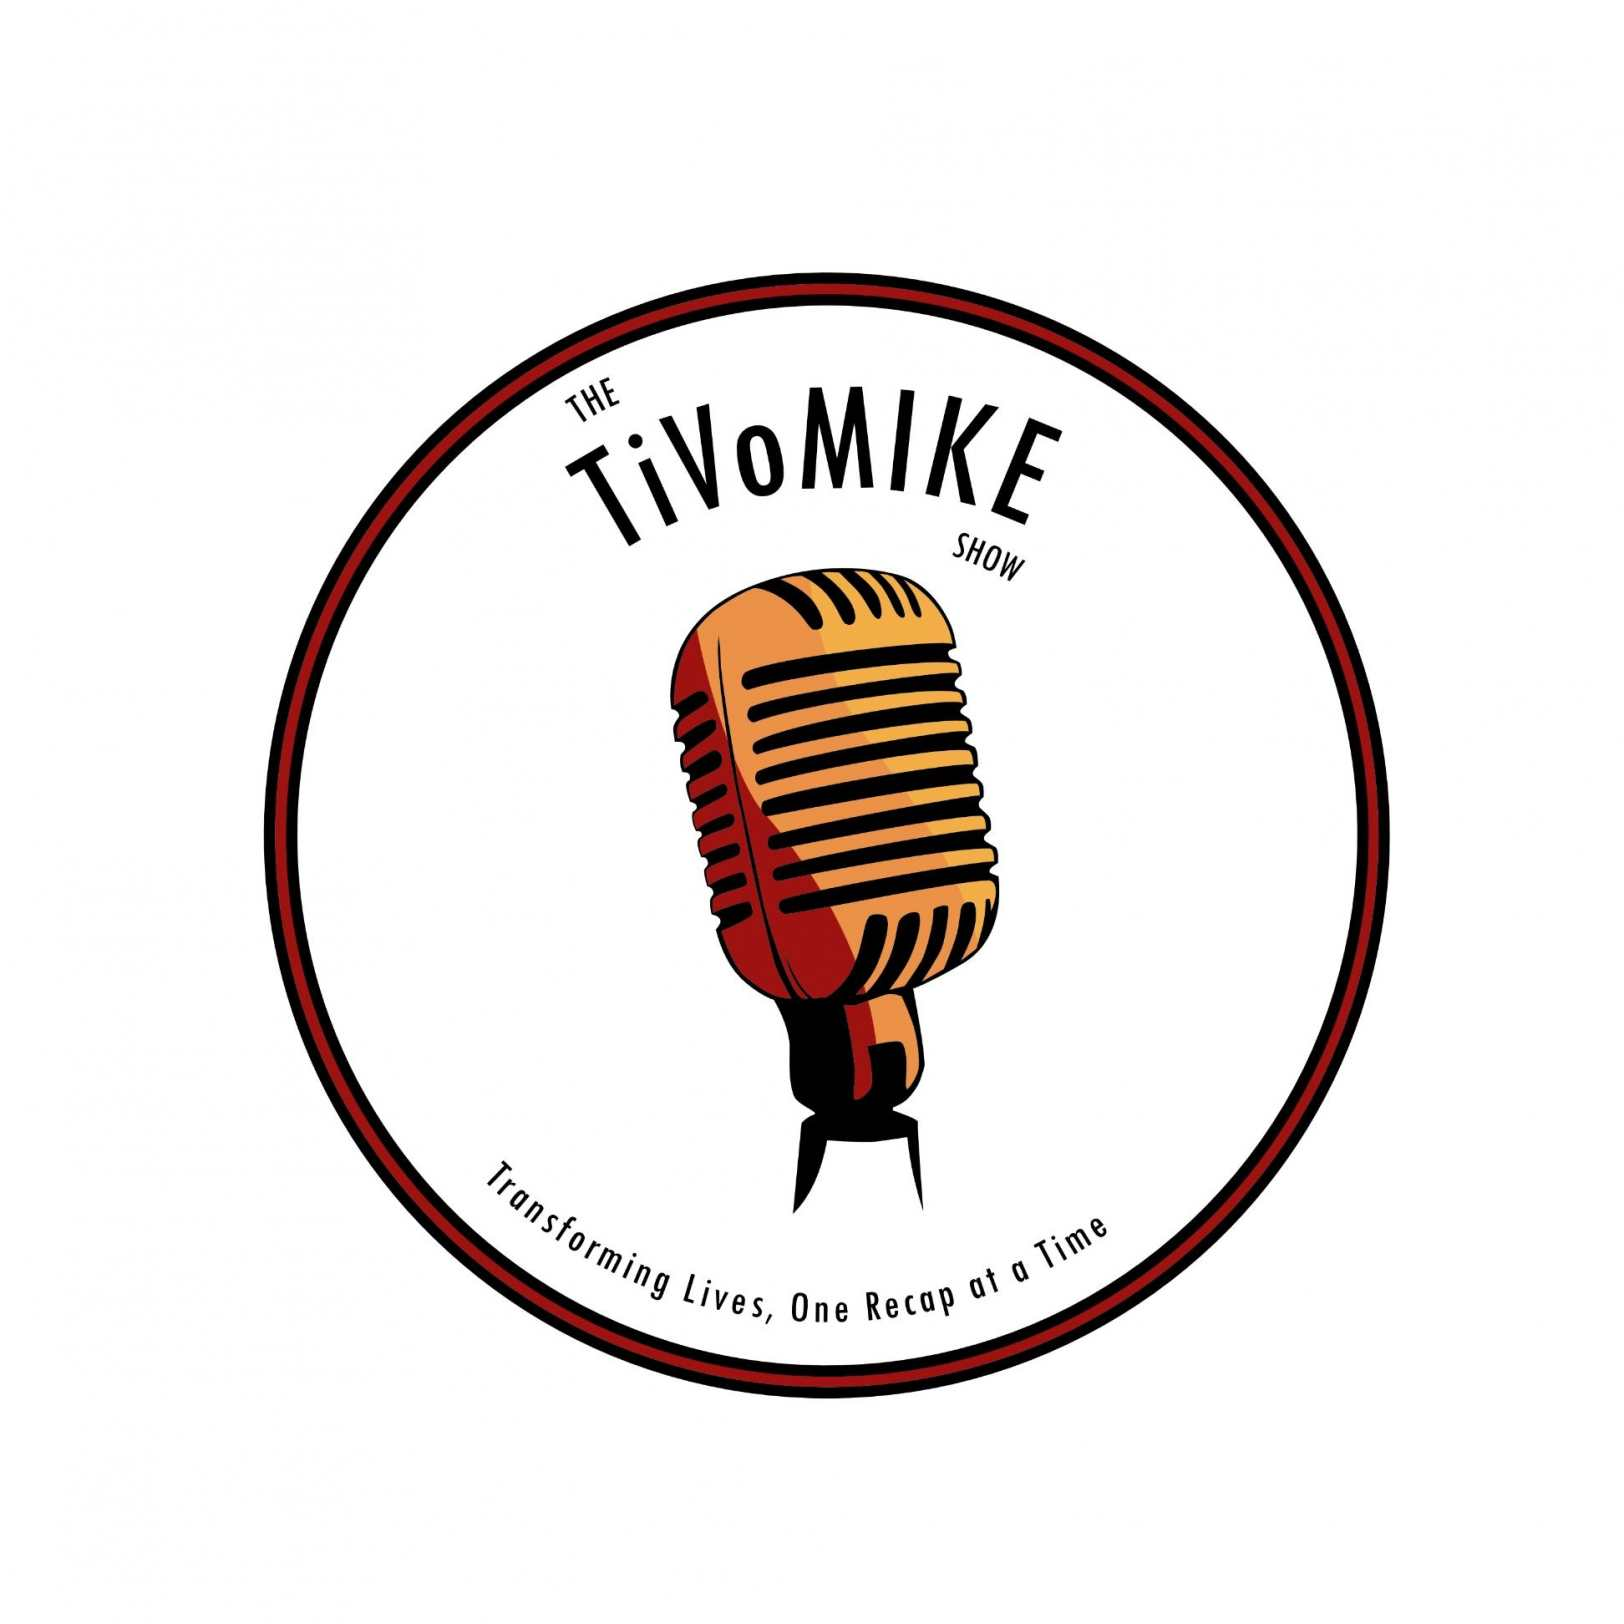 The TiVoMike Show Logo